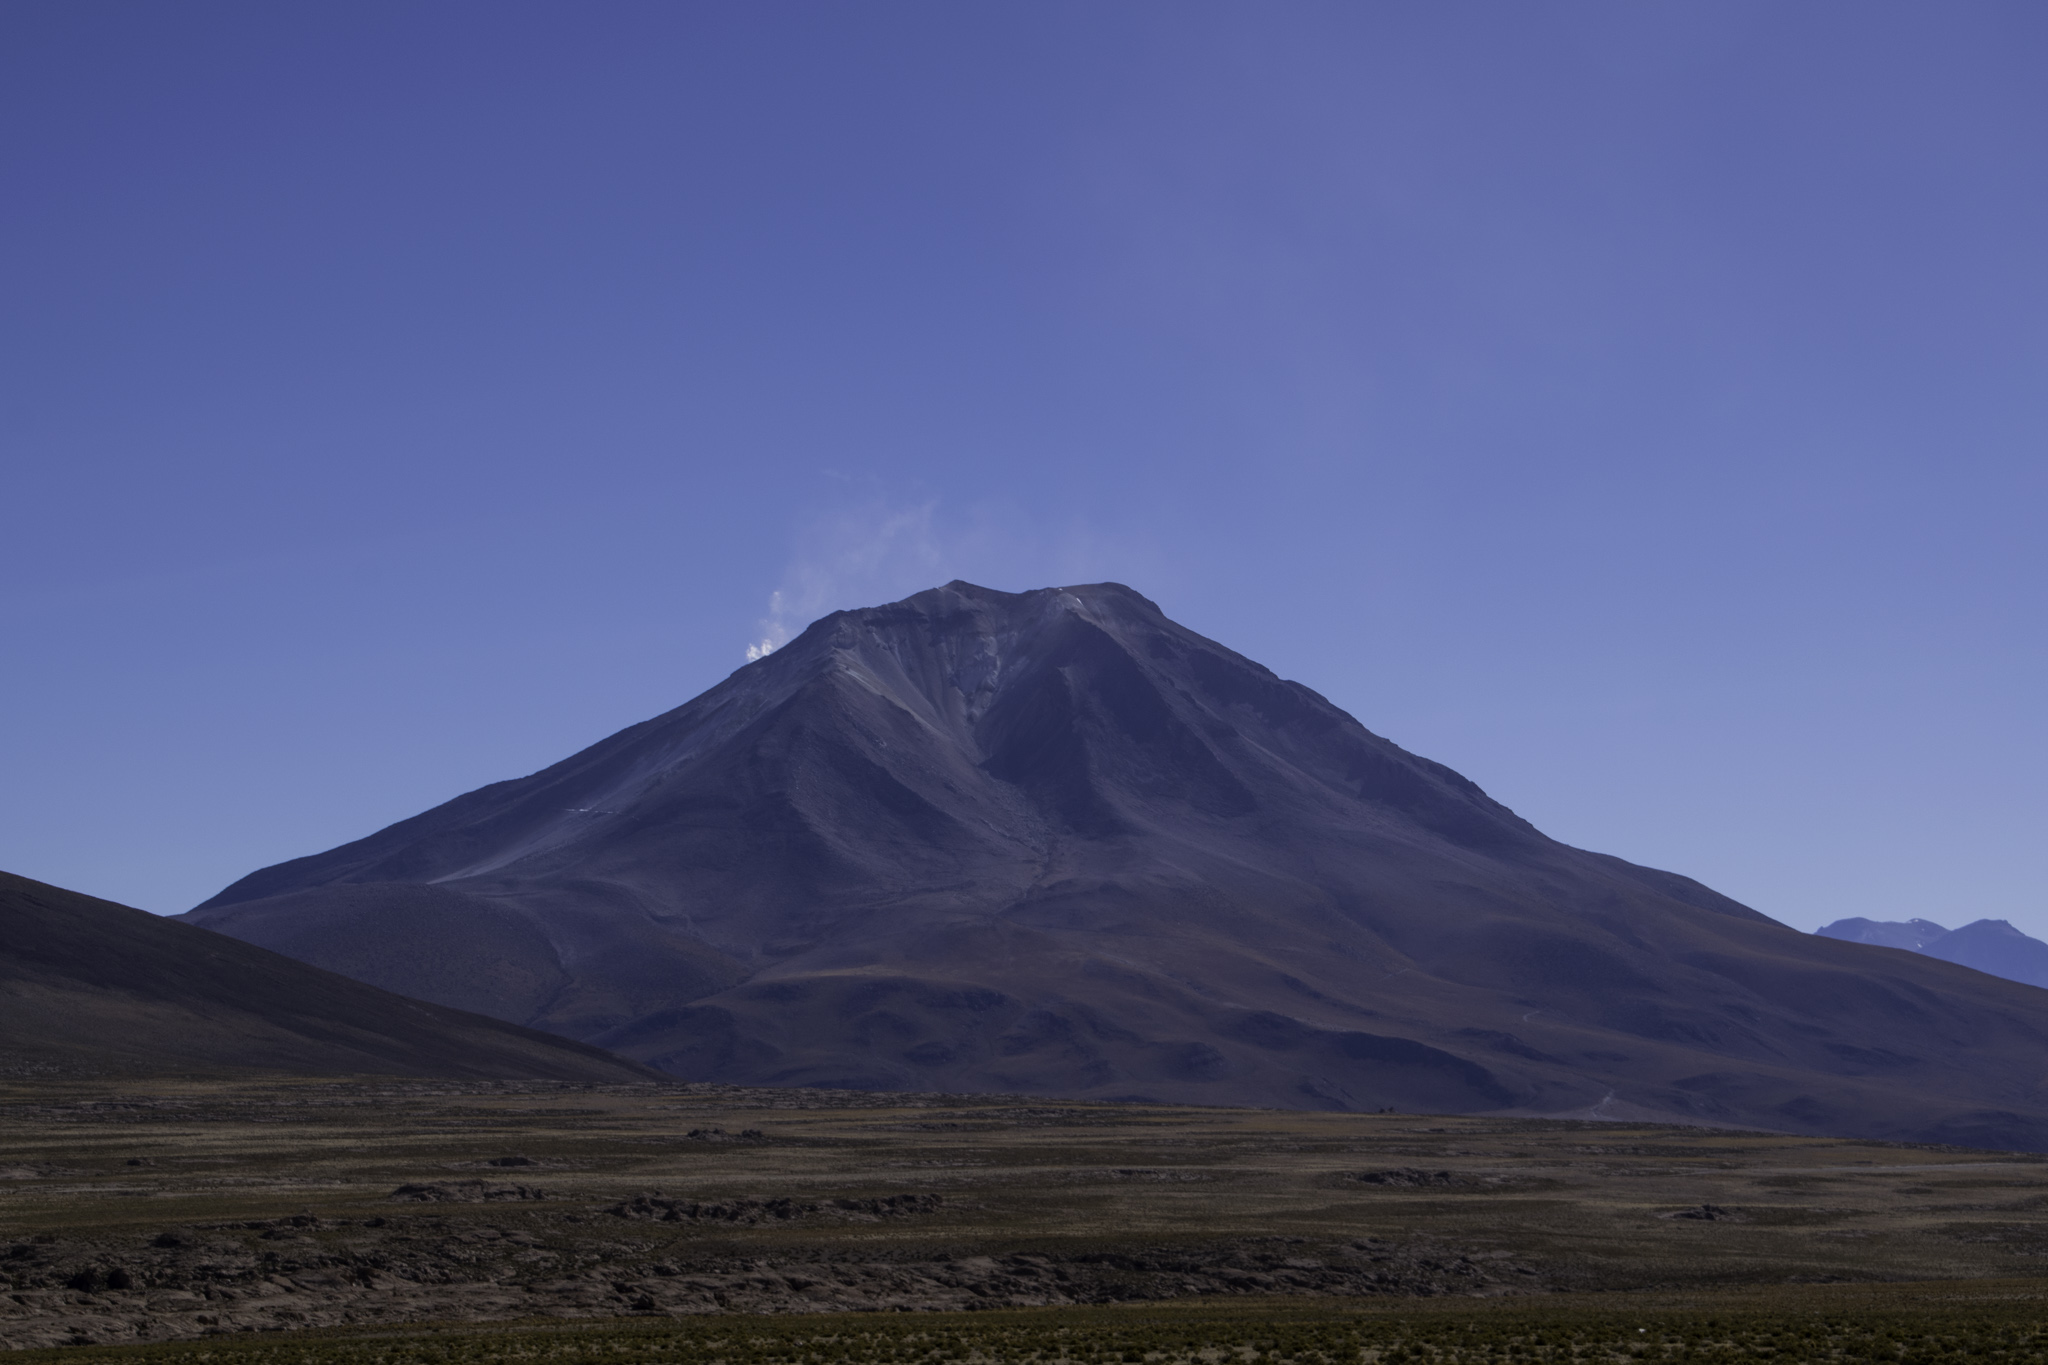 Der rauchende Vulkan Ollagüe